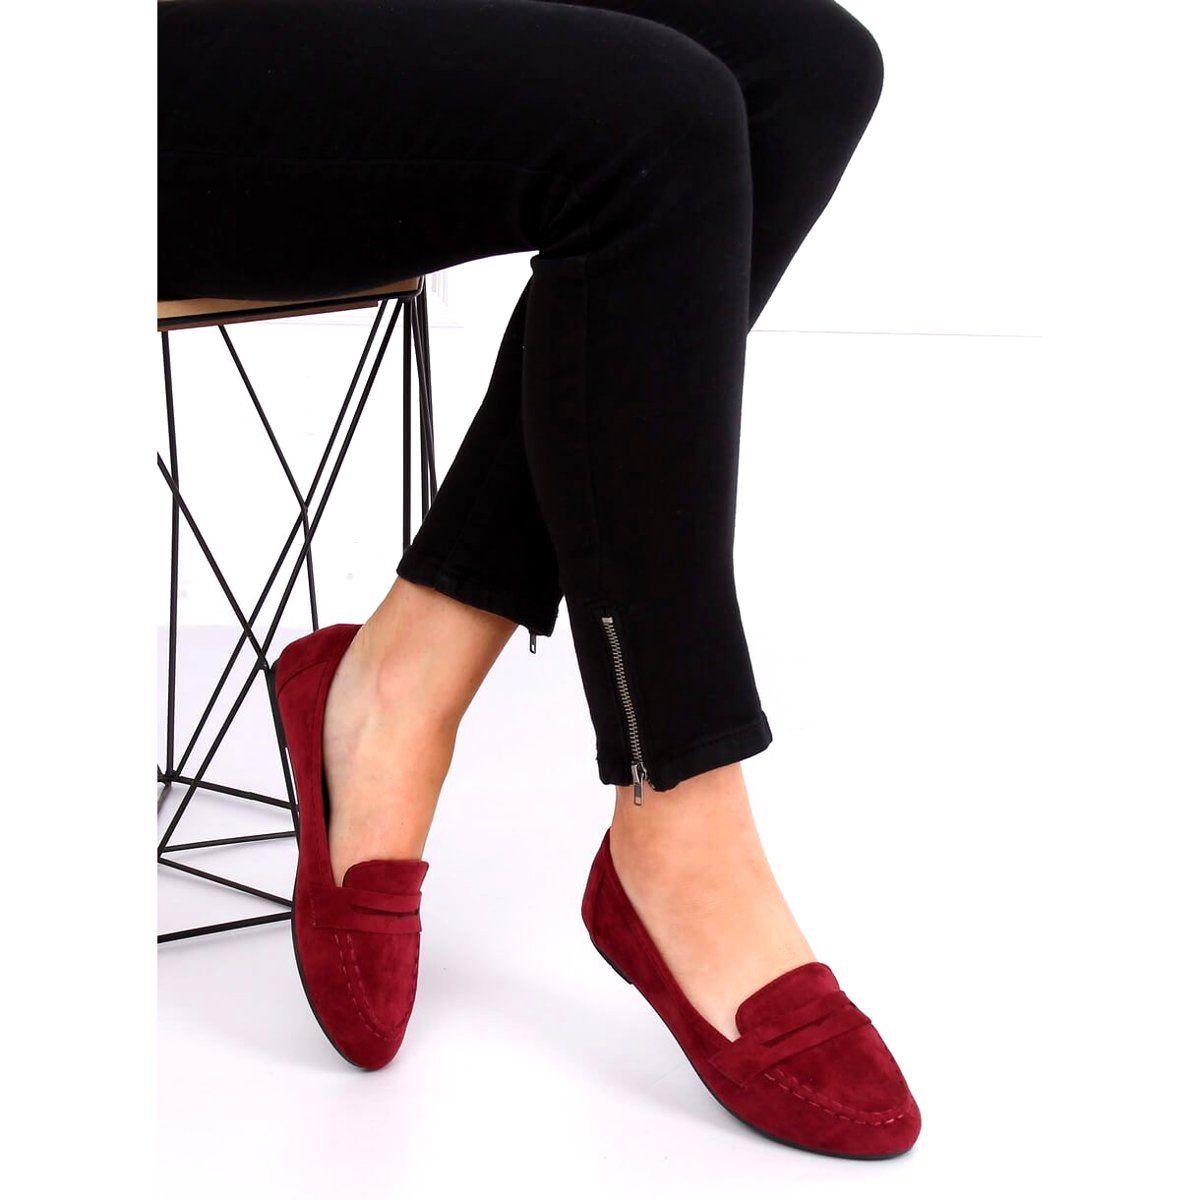 Mokasyny Damskie Bordowe B2030 Wine Czerwone Mule Shoe Shoes Slippers